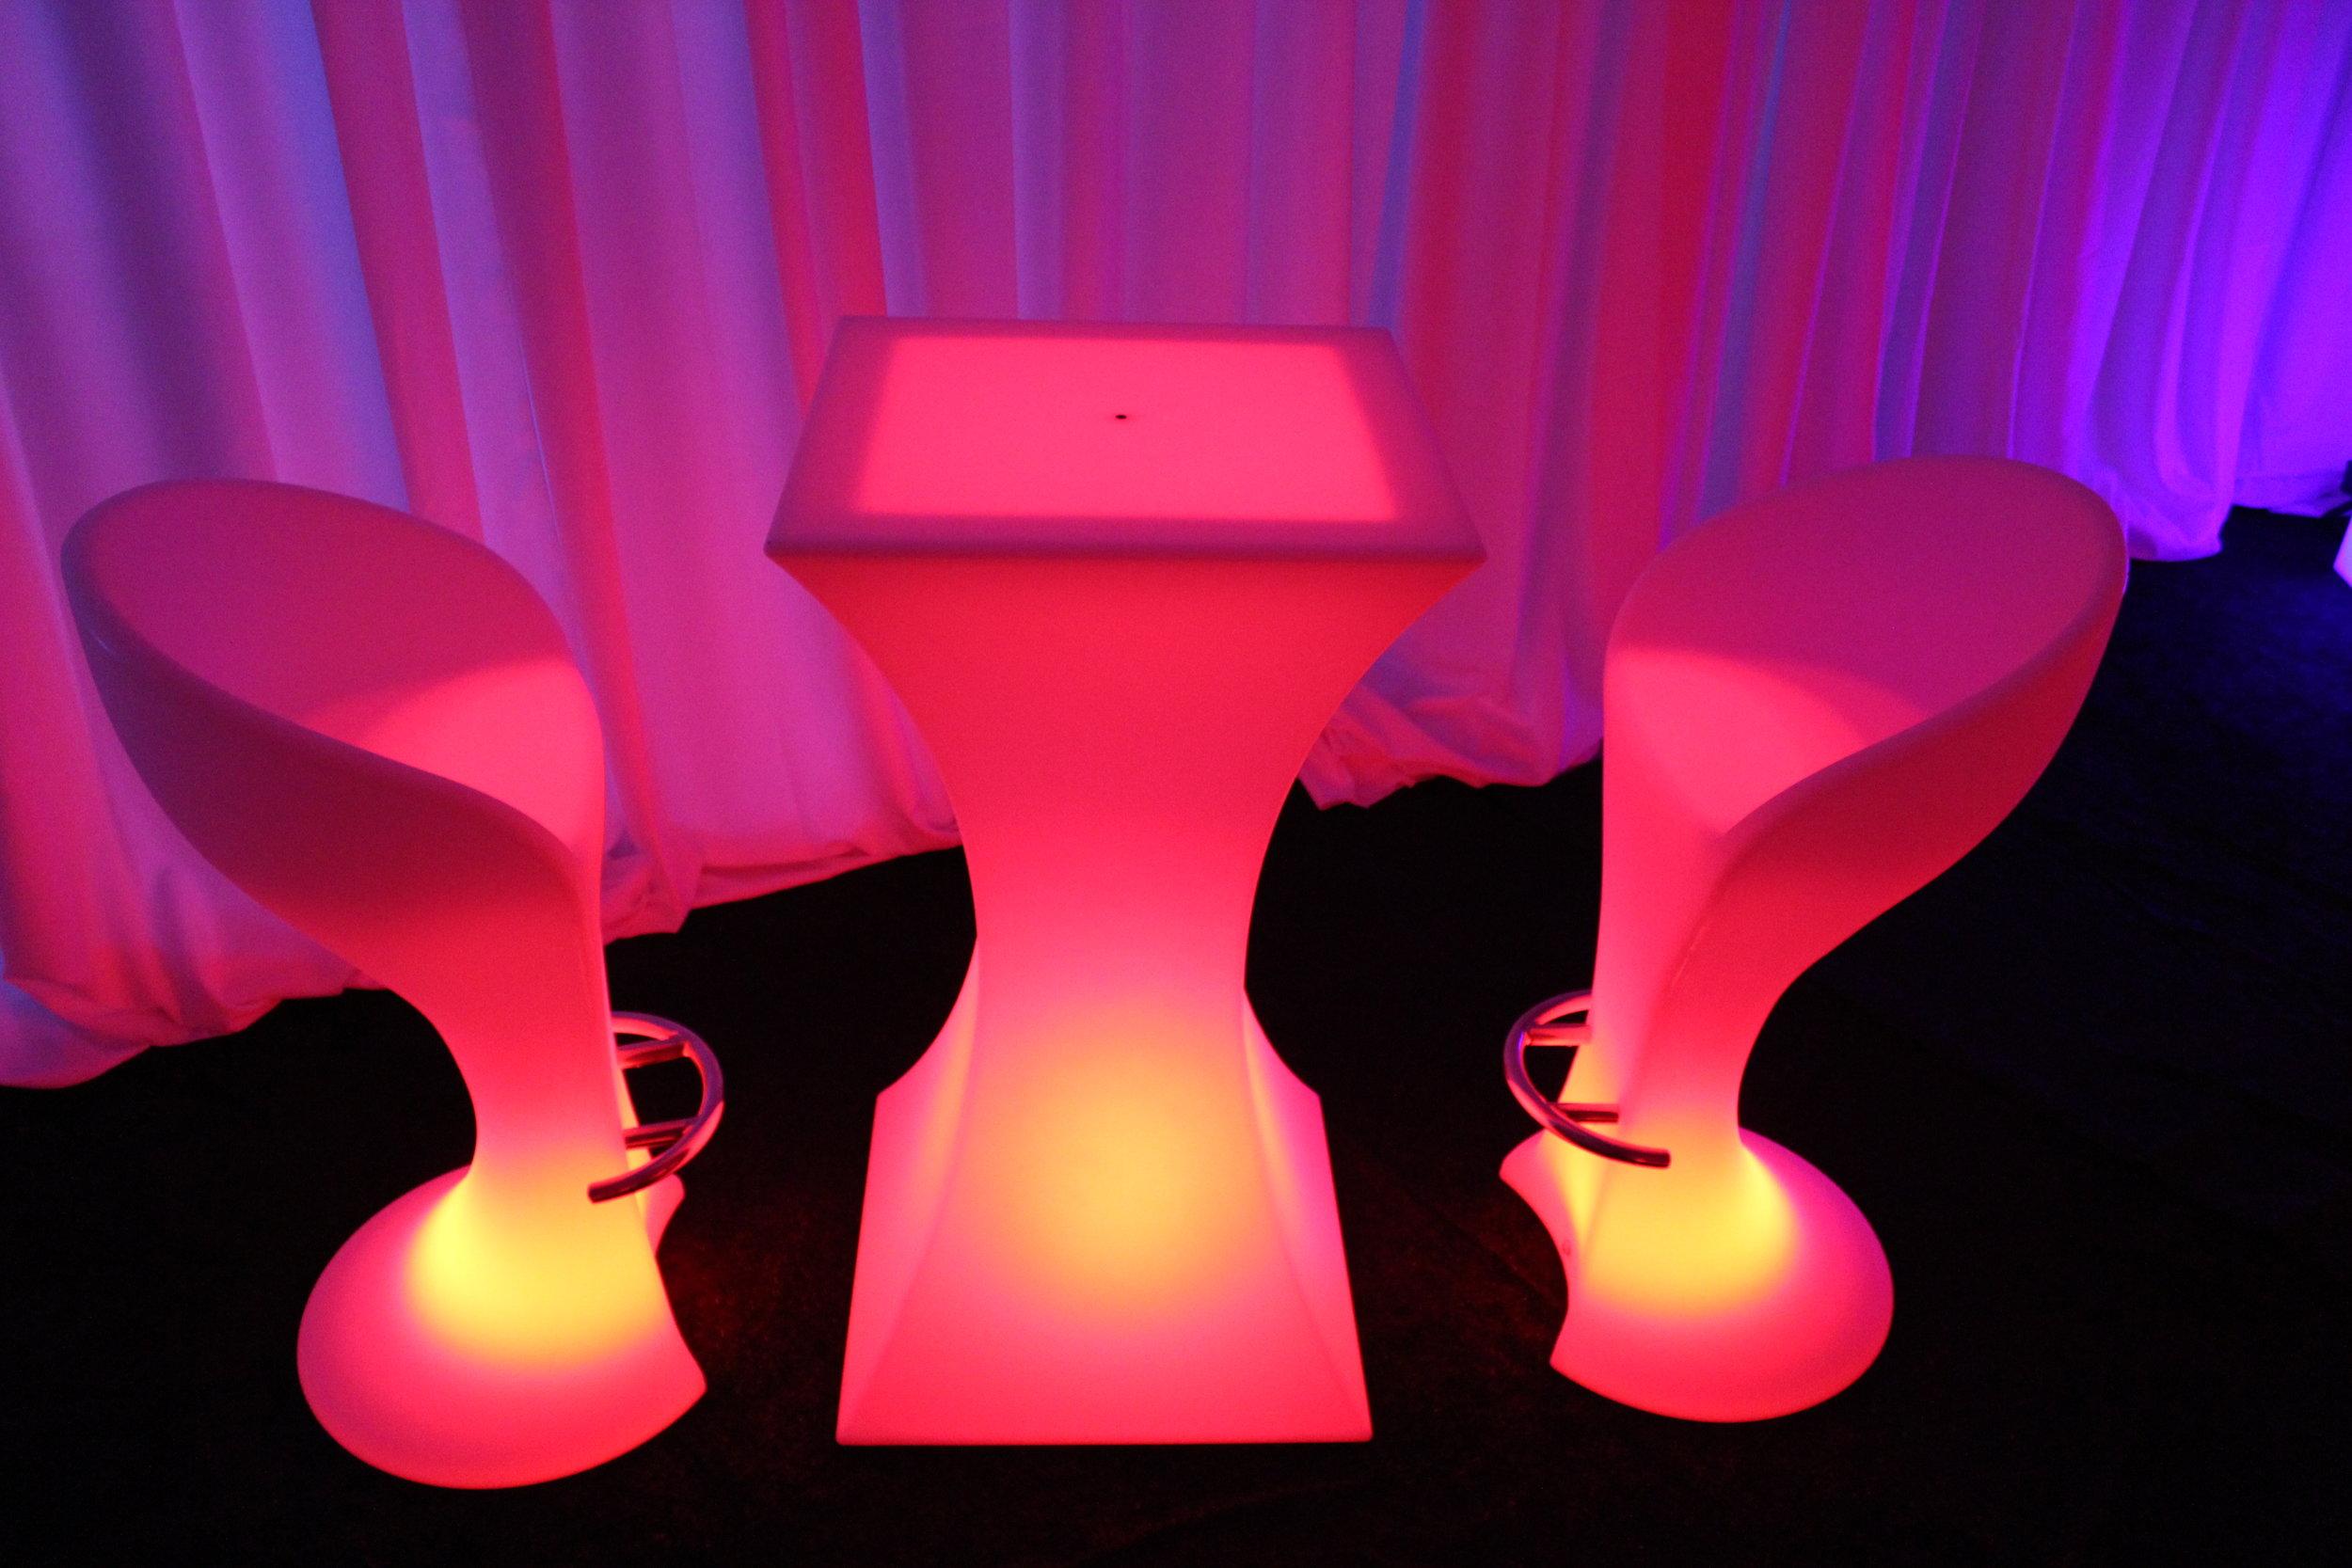 acrylic furniture rentals